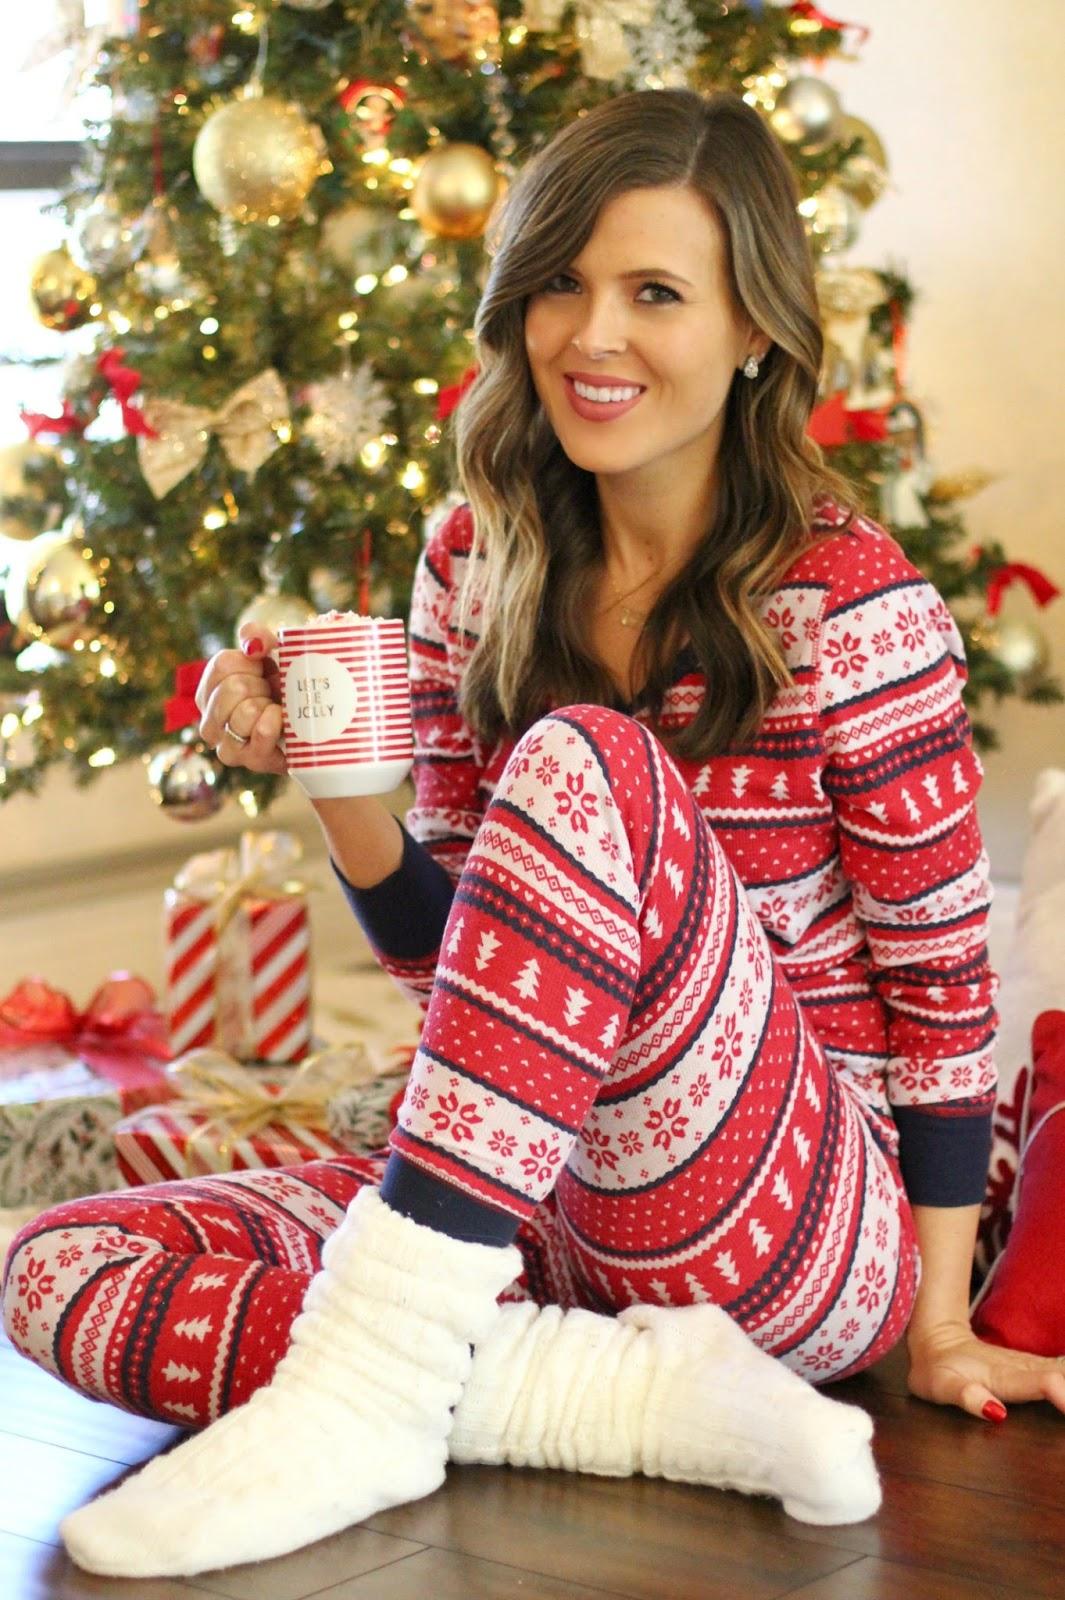 His & Hers Holiday Pajamas Under $100 - Brie Bemis Rearick